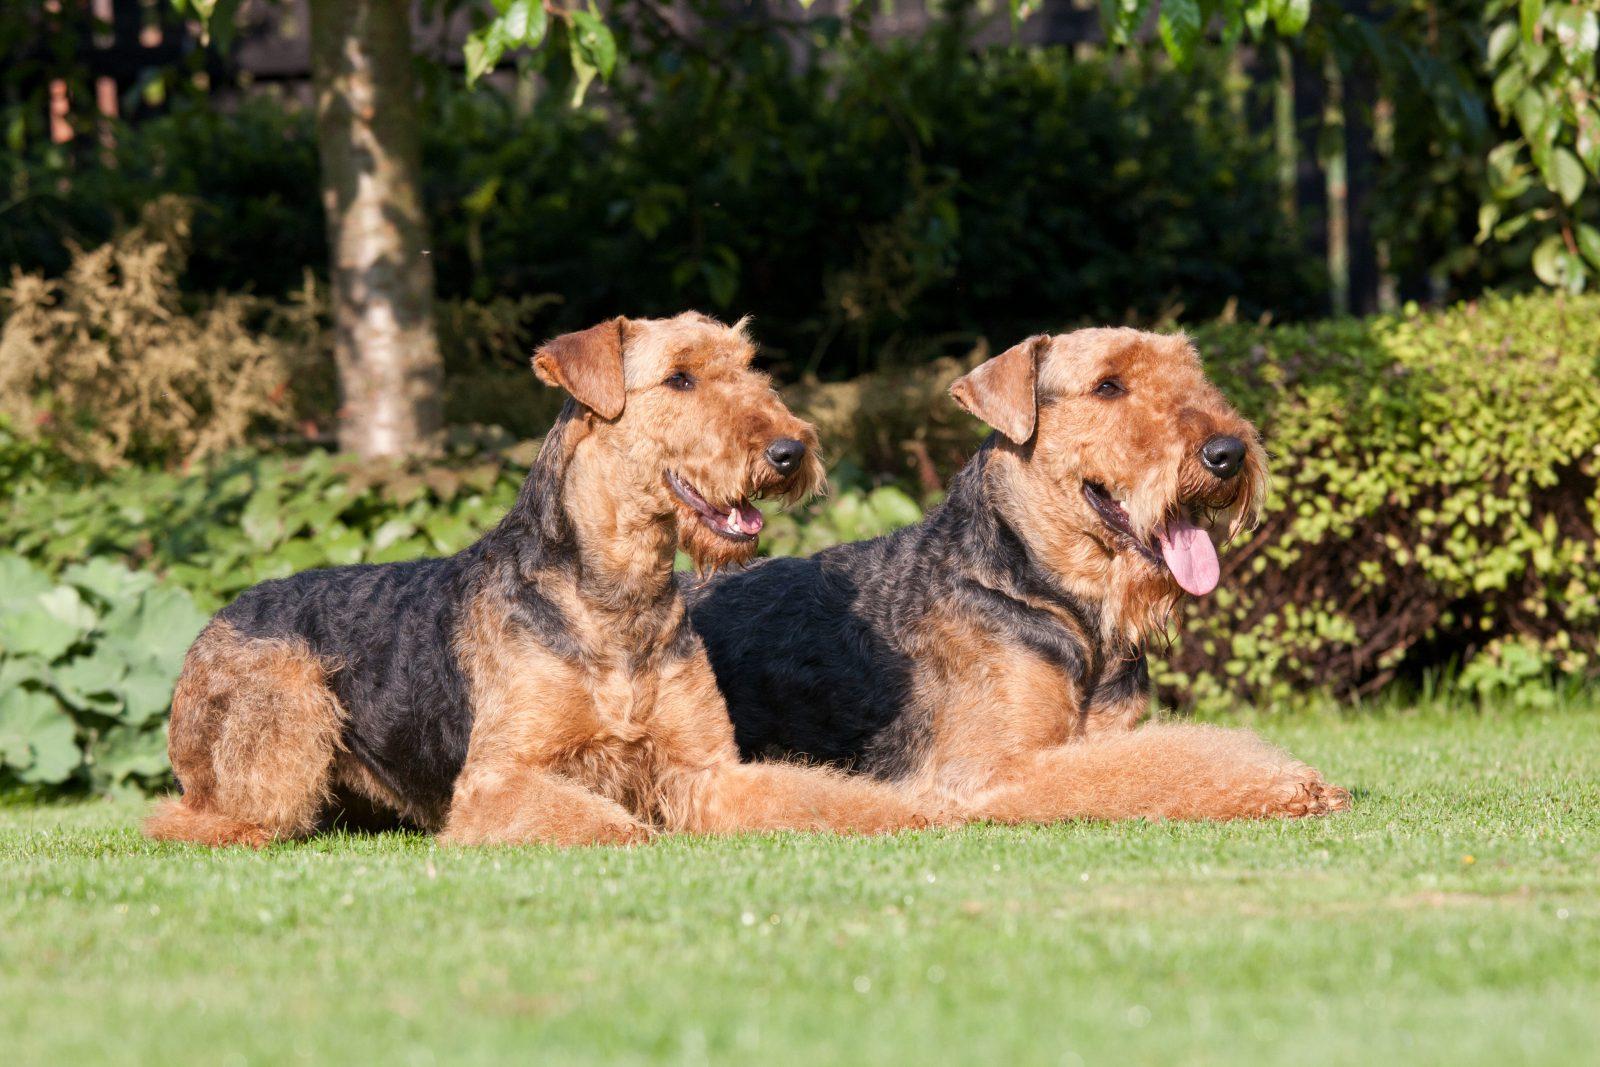 cao-airedale-terrier-origem